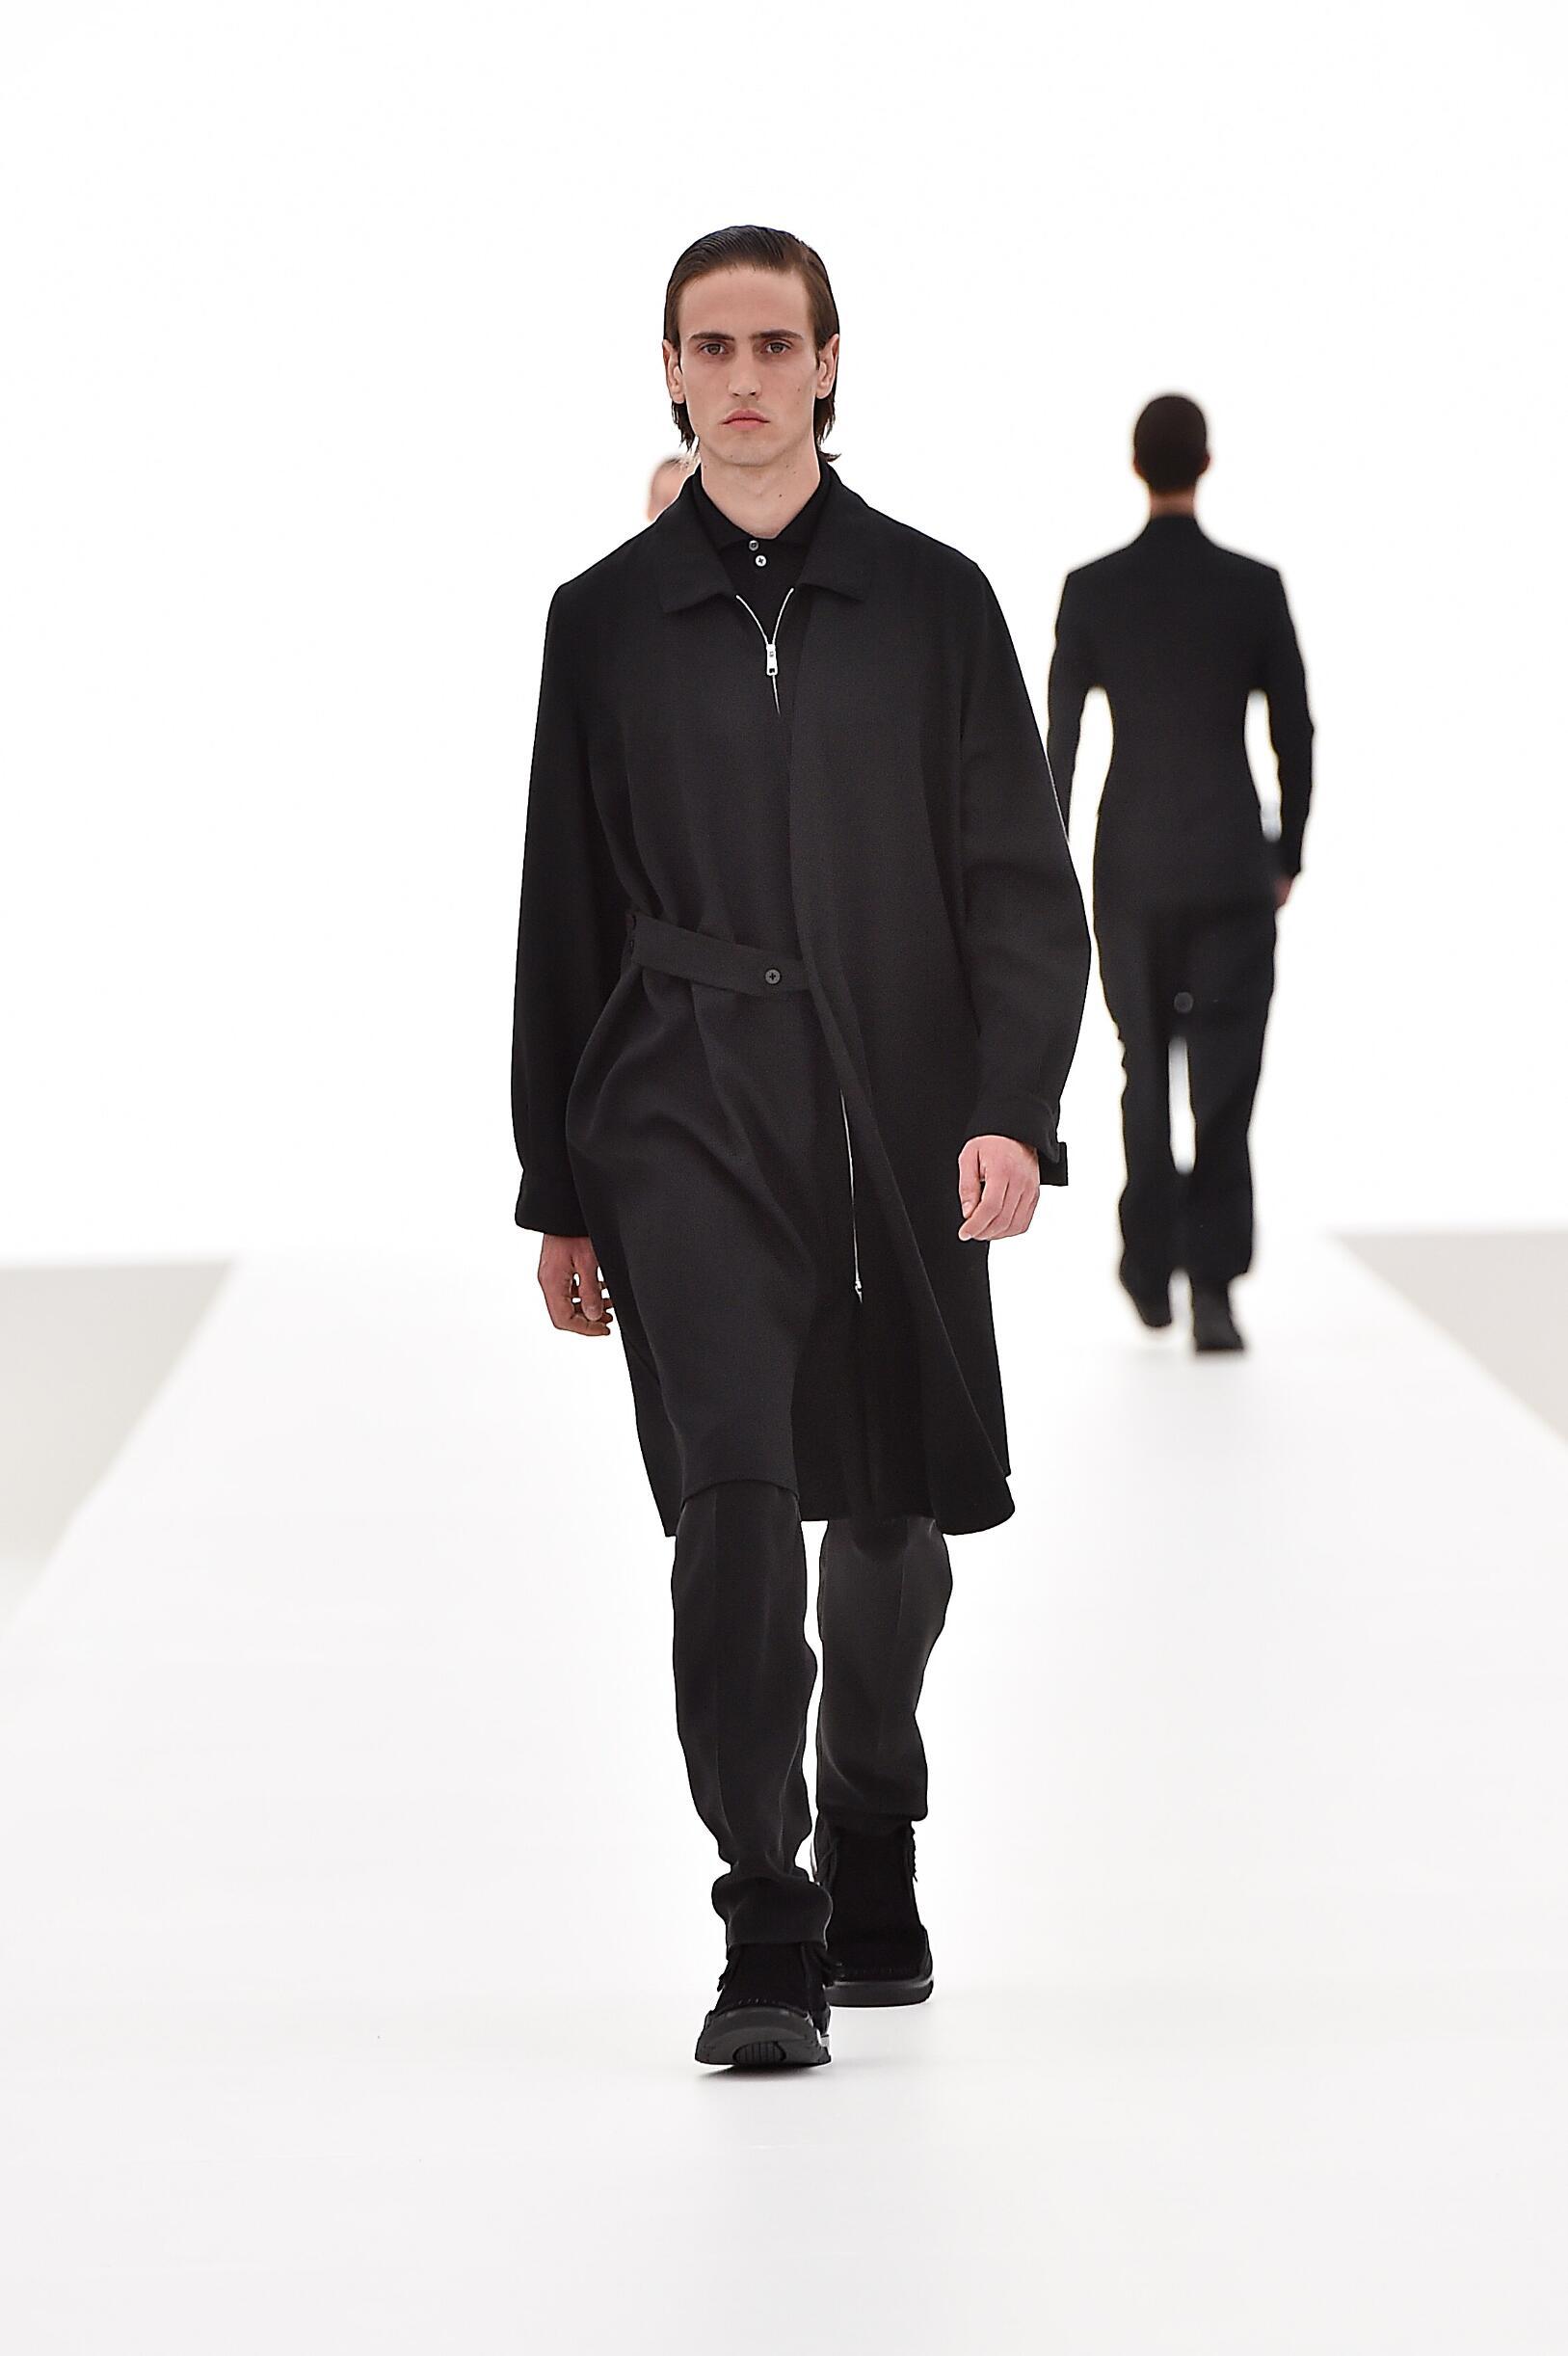 2016 Spring Fashion Man Ermenegildo Zegna Couture Collection